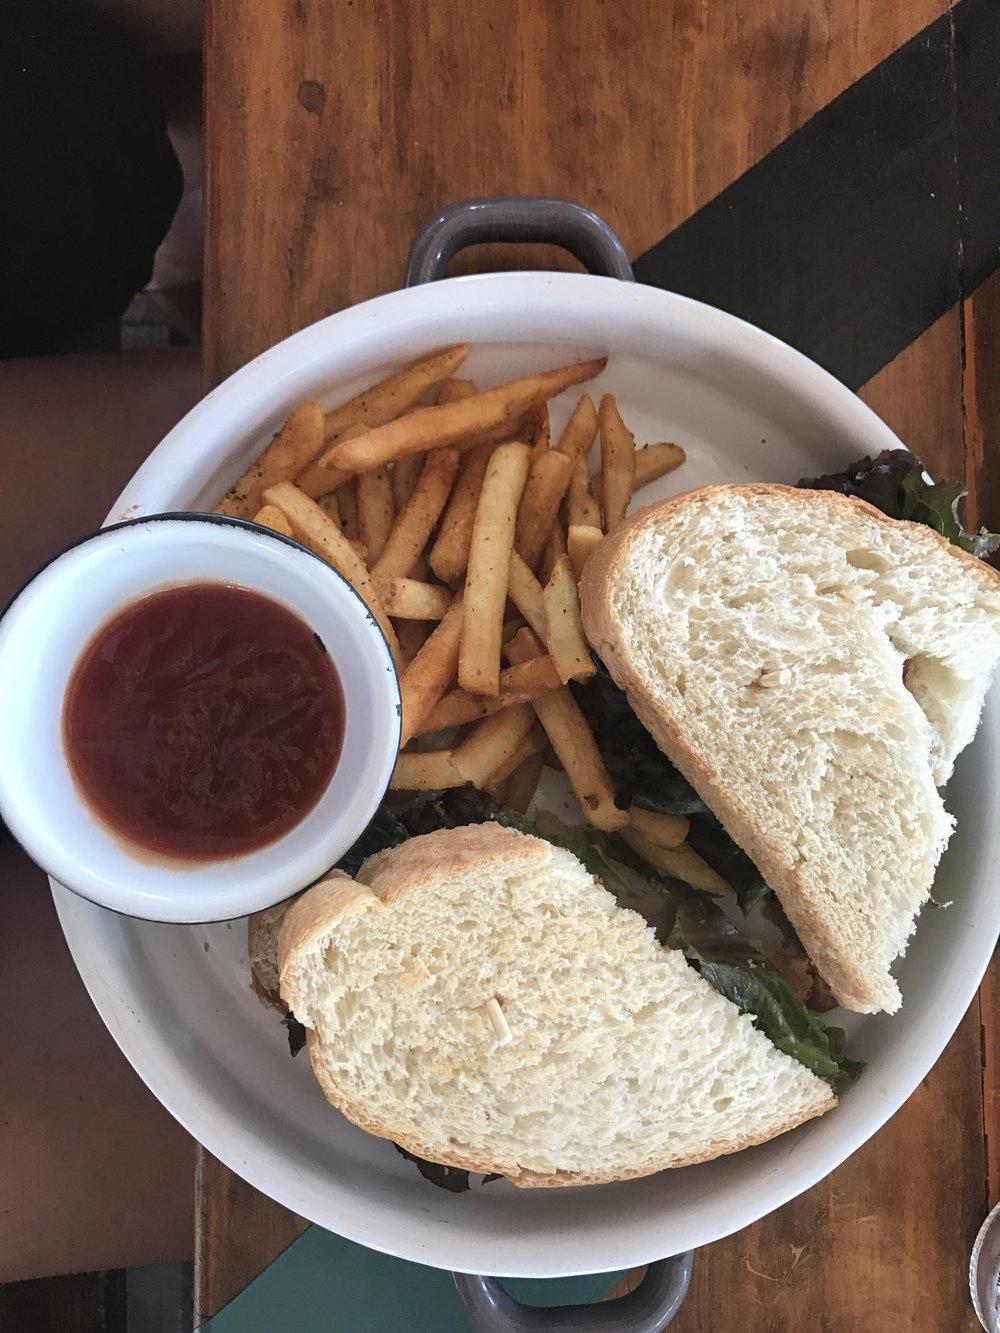 Papaya+Playa+Tuna+Sandwich.jpg